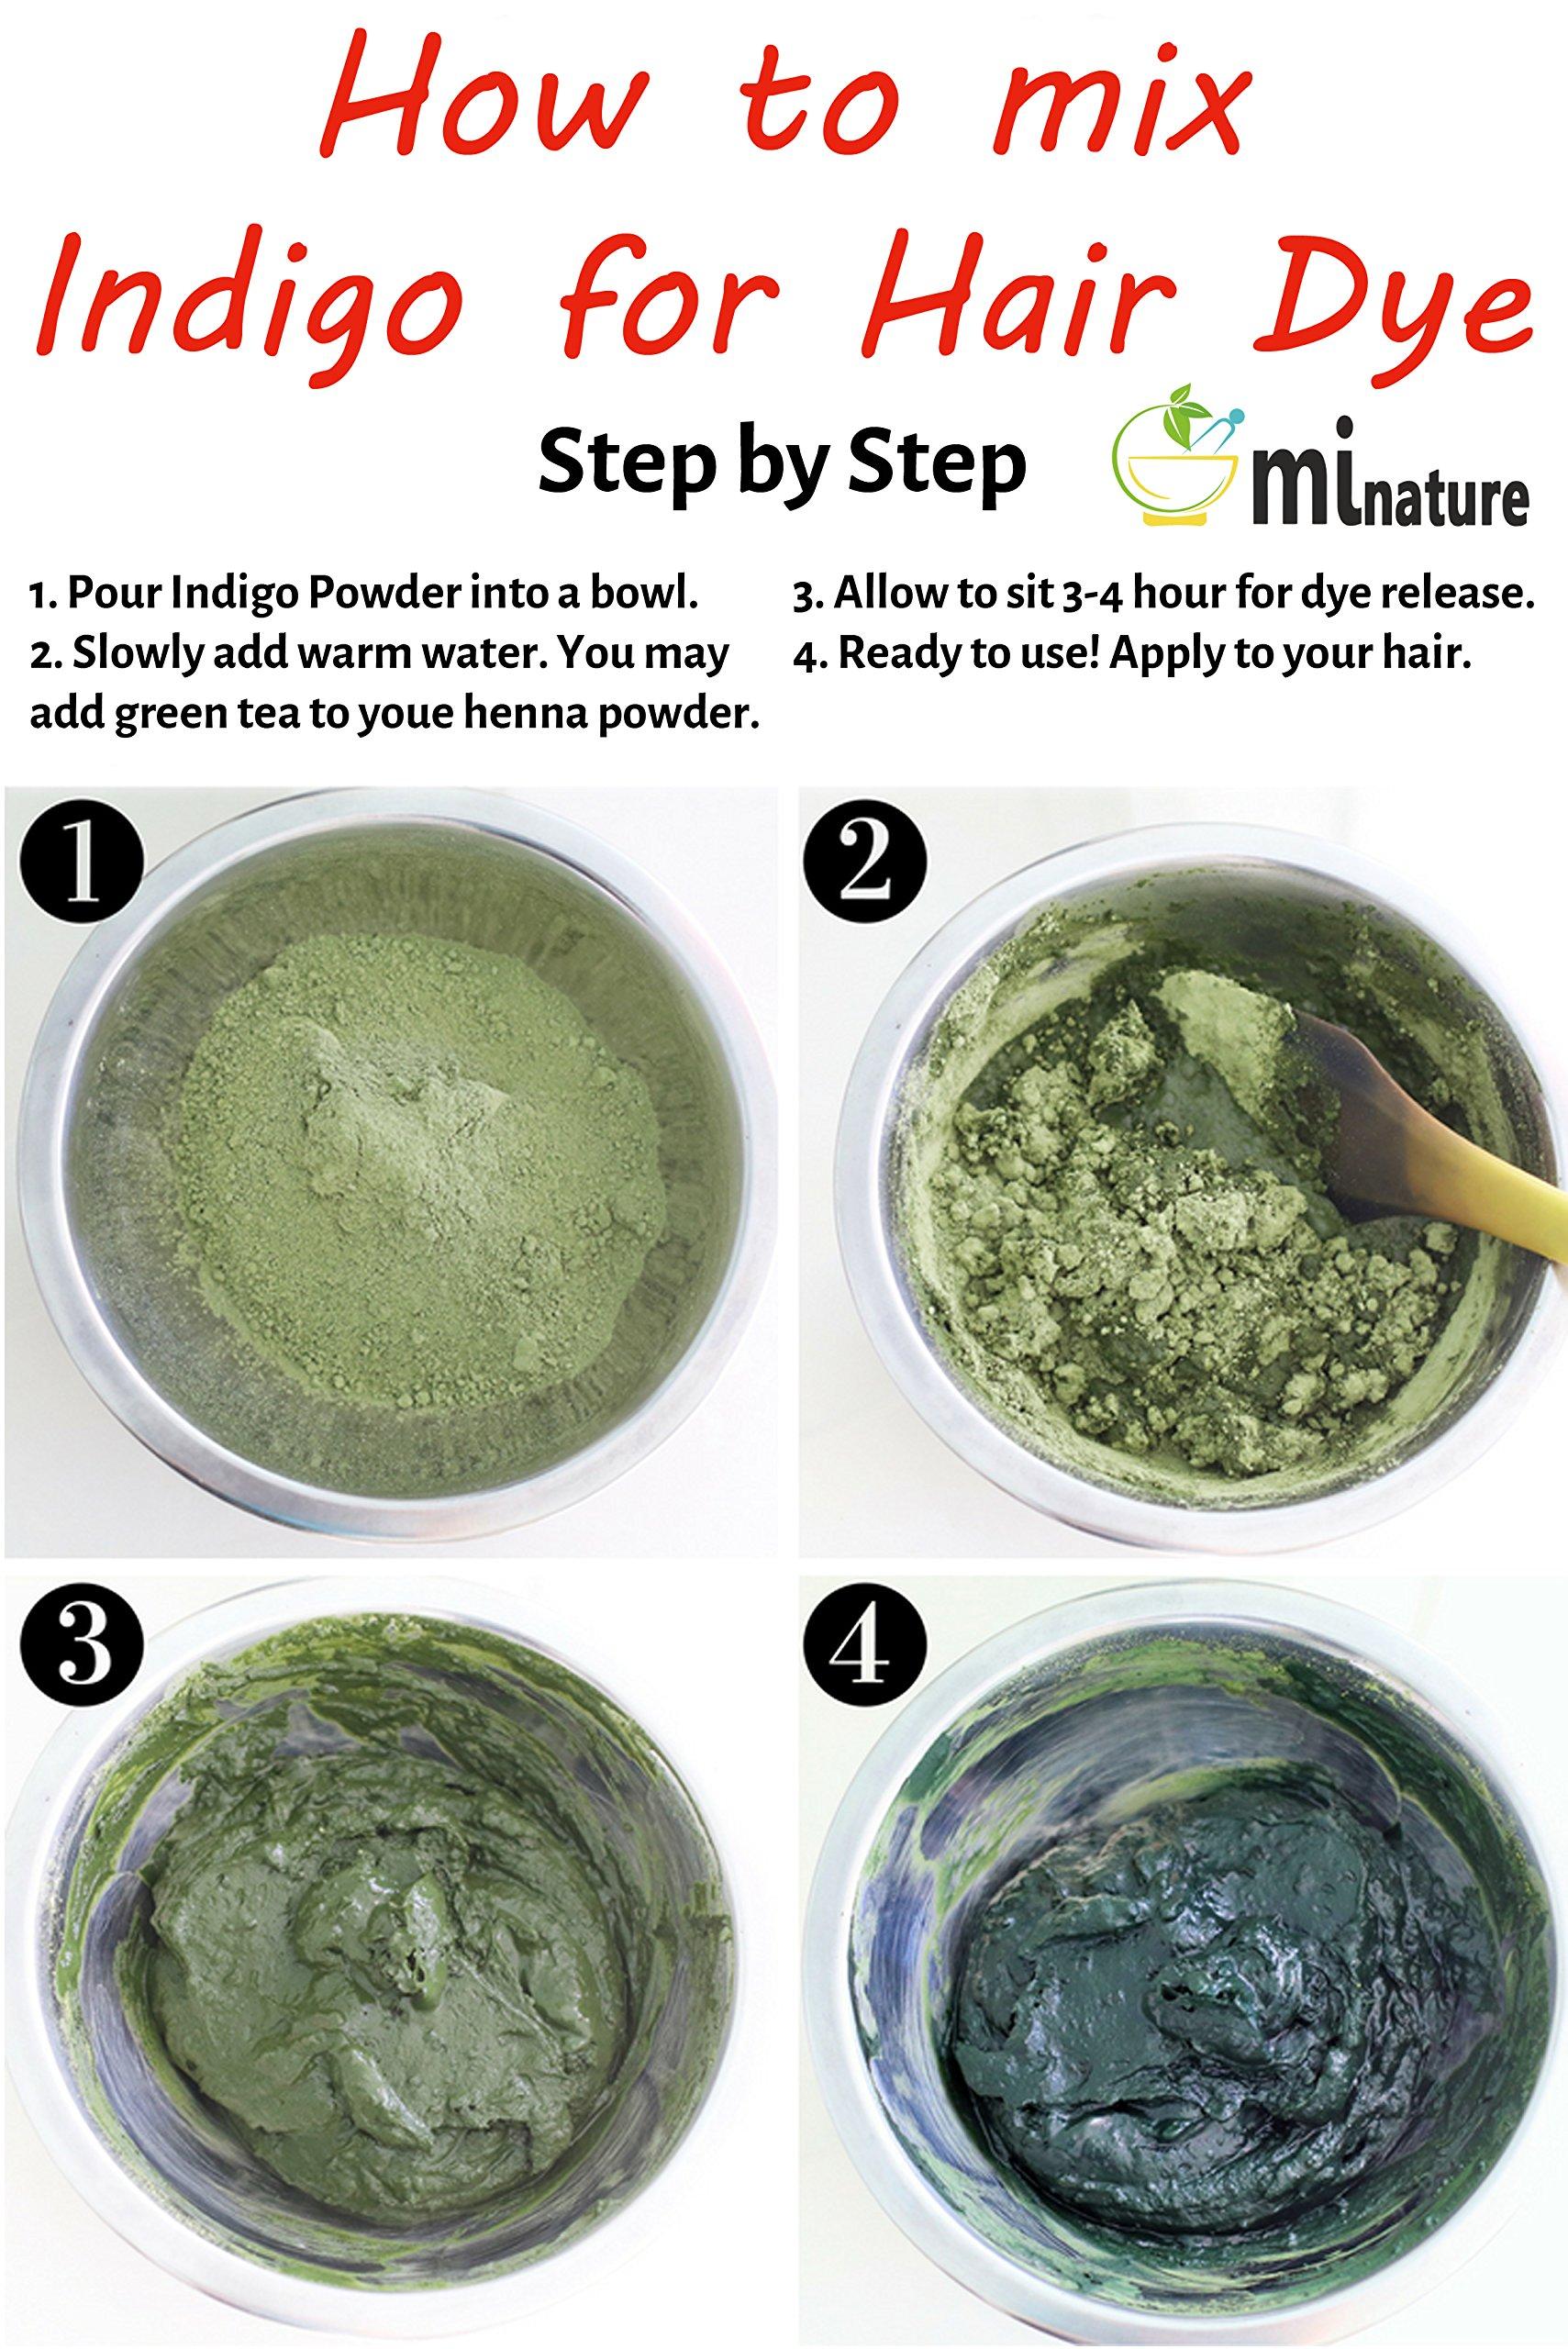 mi nature Indigo Powder -INDIGOFERA TINCTORIA,(100% NATURAL, ORGANICALLY GROWN) 1 LB (454 grams/16 ounces) RESEALABLE BAG by mi nature (Image #4)